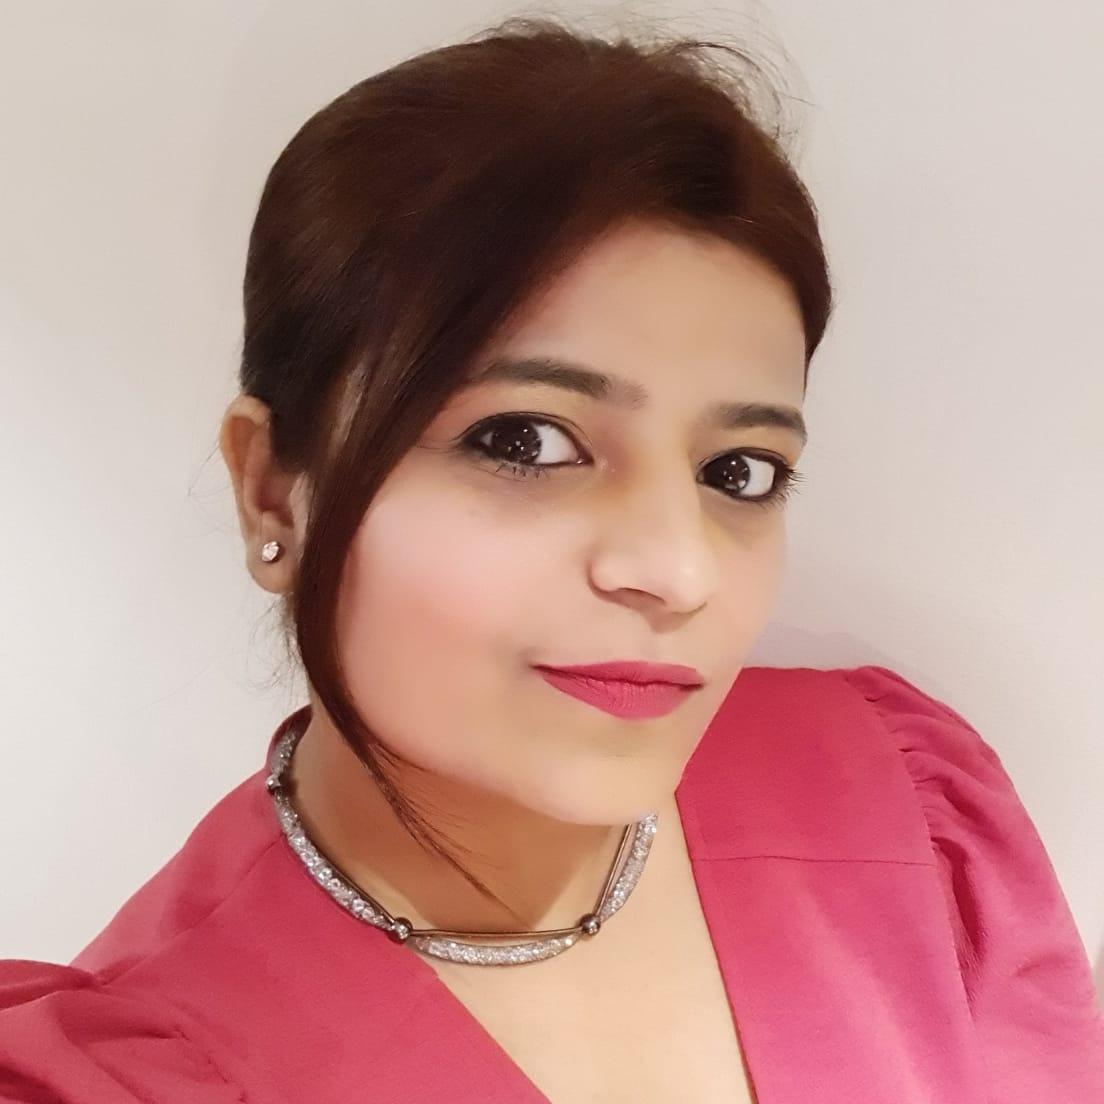 About Sristhi Agarwal